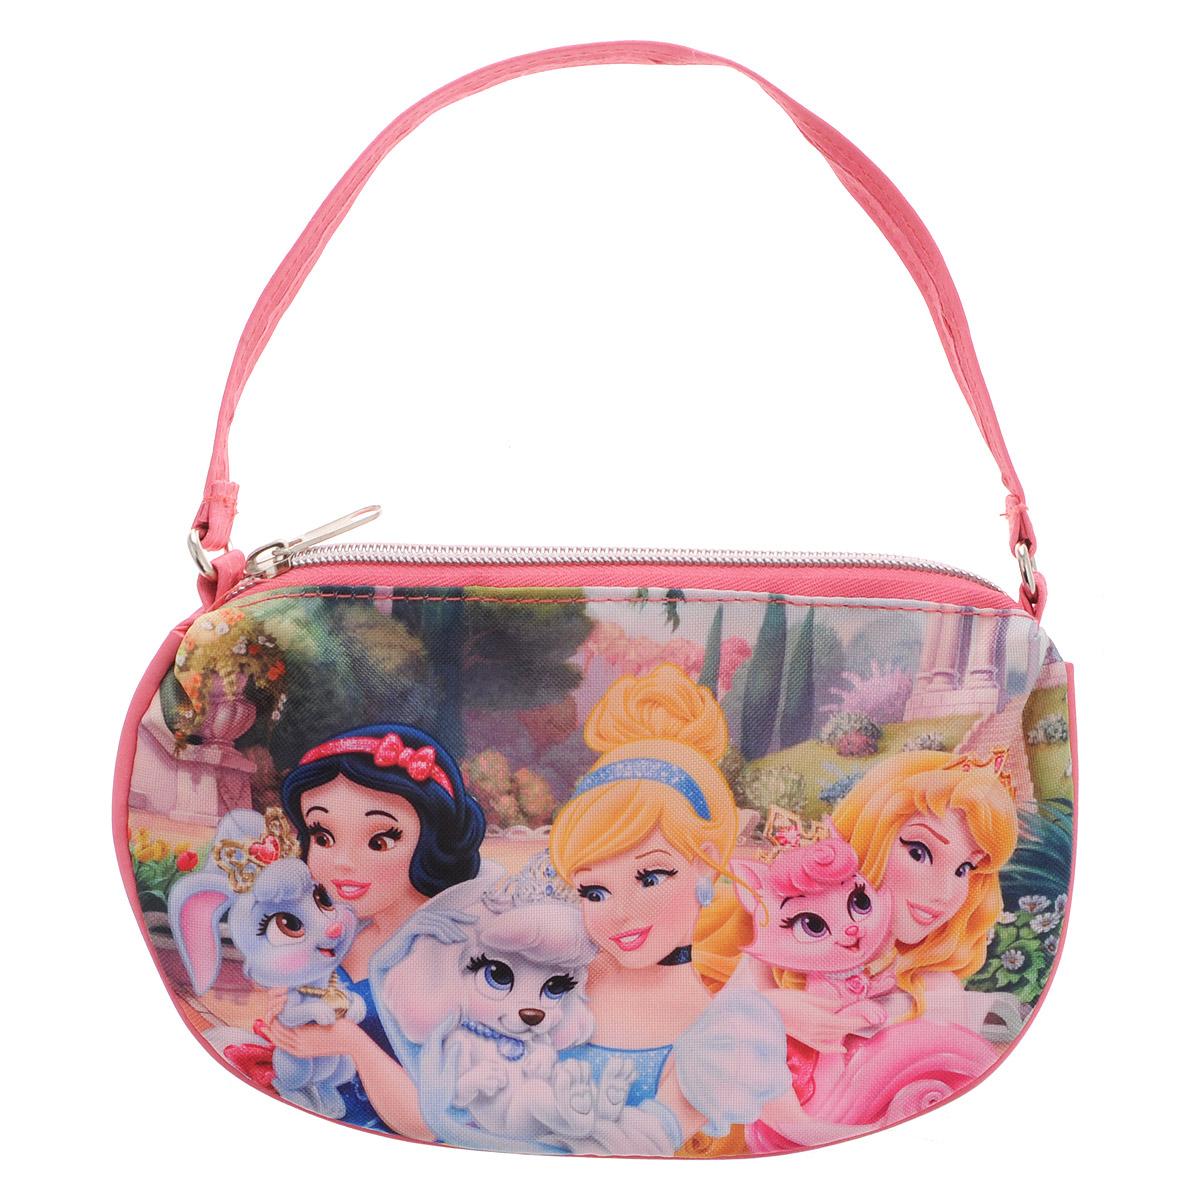 Сумочка Princess, цвет: розовый. PRCB-UT4-4017 сумочка princess цвет розовый prcb ut4 4017